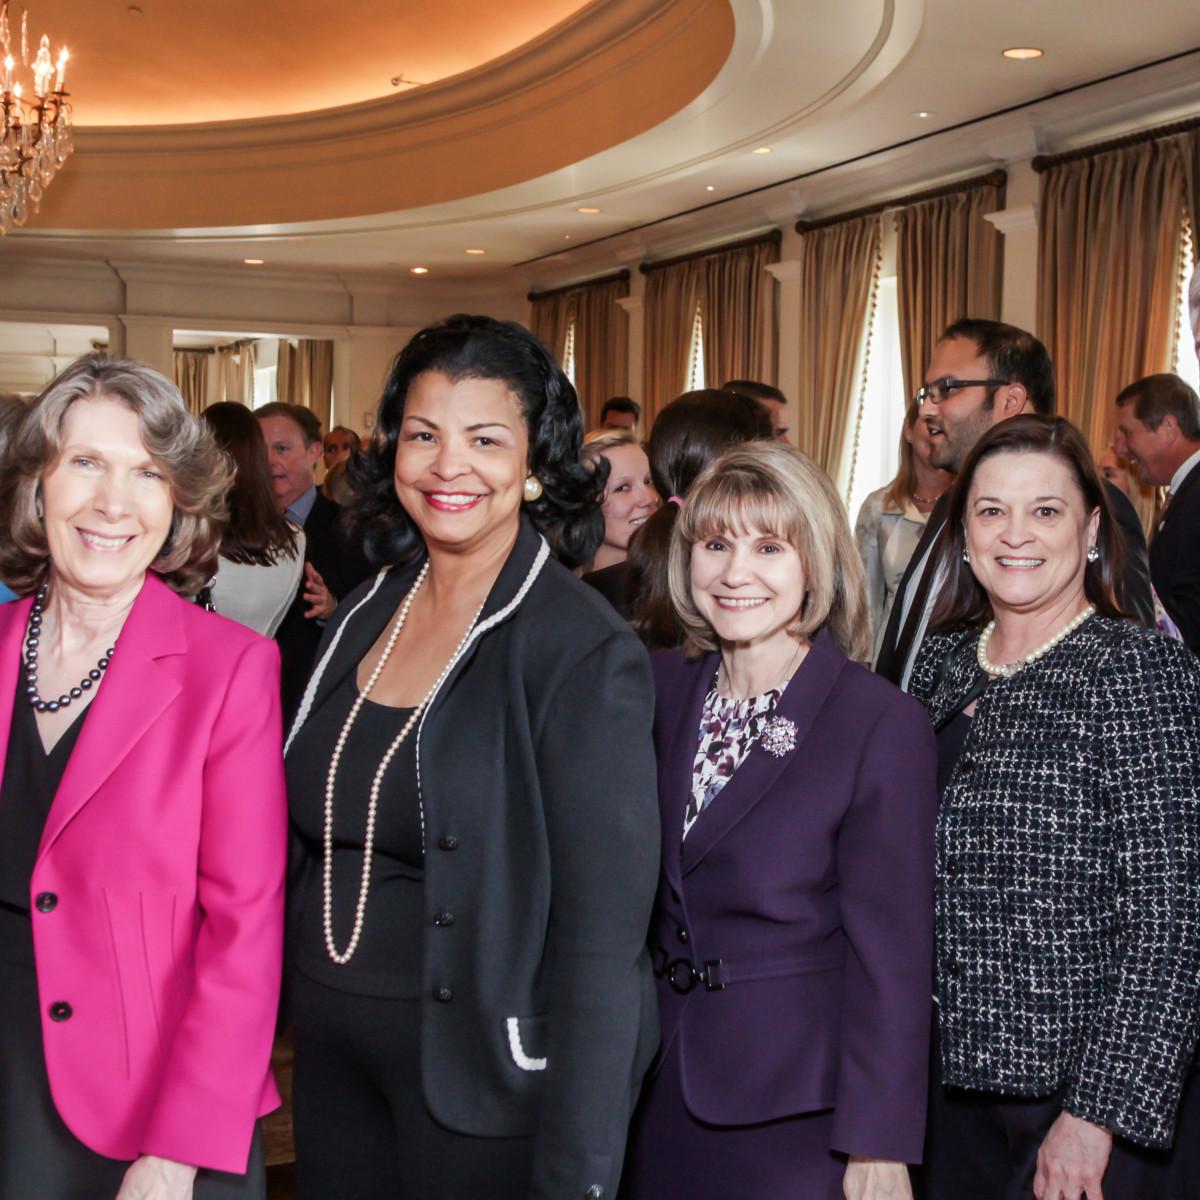 FAmily Houston, March 2016, Linda O'Black, Cynthia Briggs, Anna Babin, Martha Voss, Wendel Skolaski